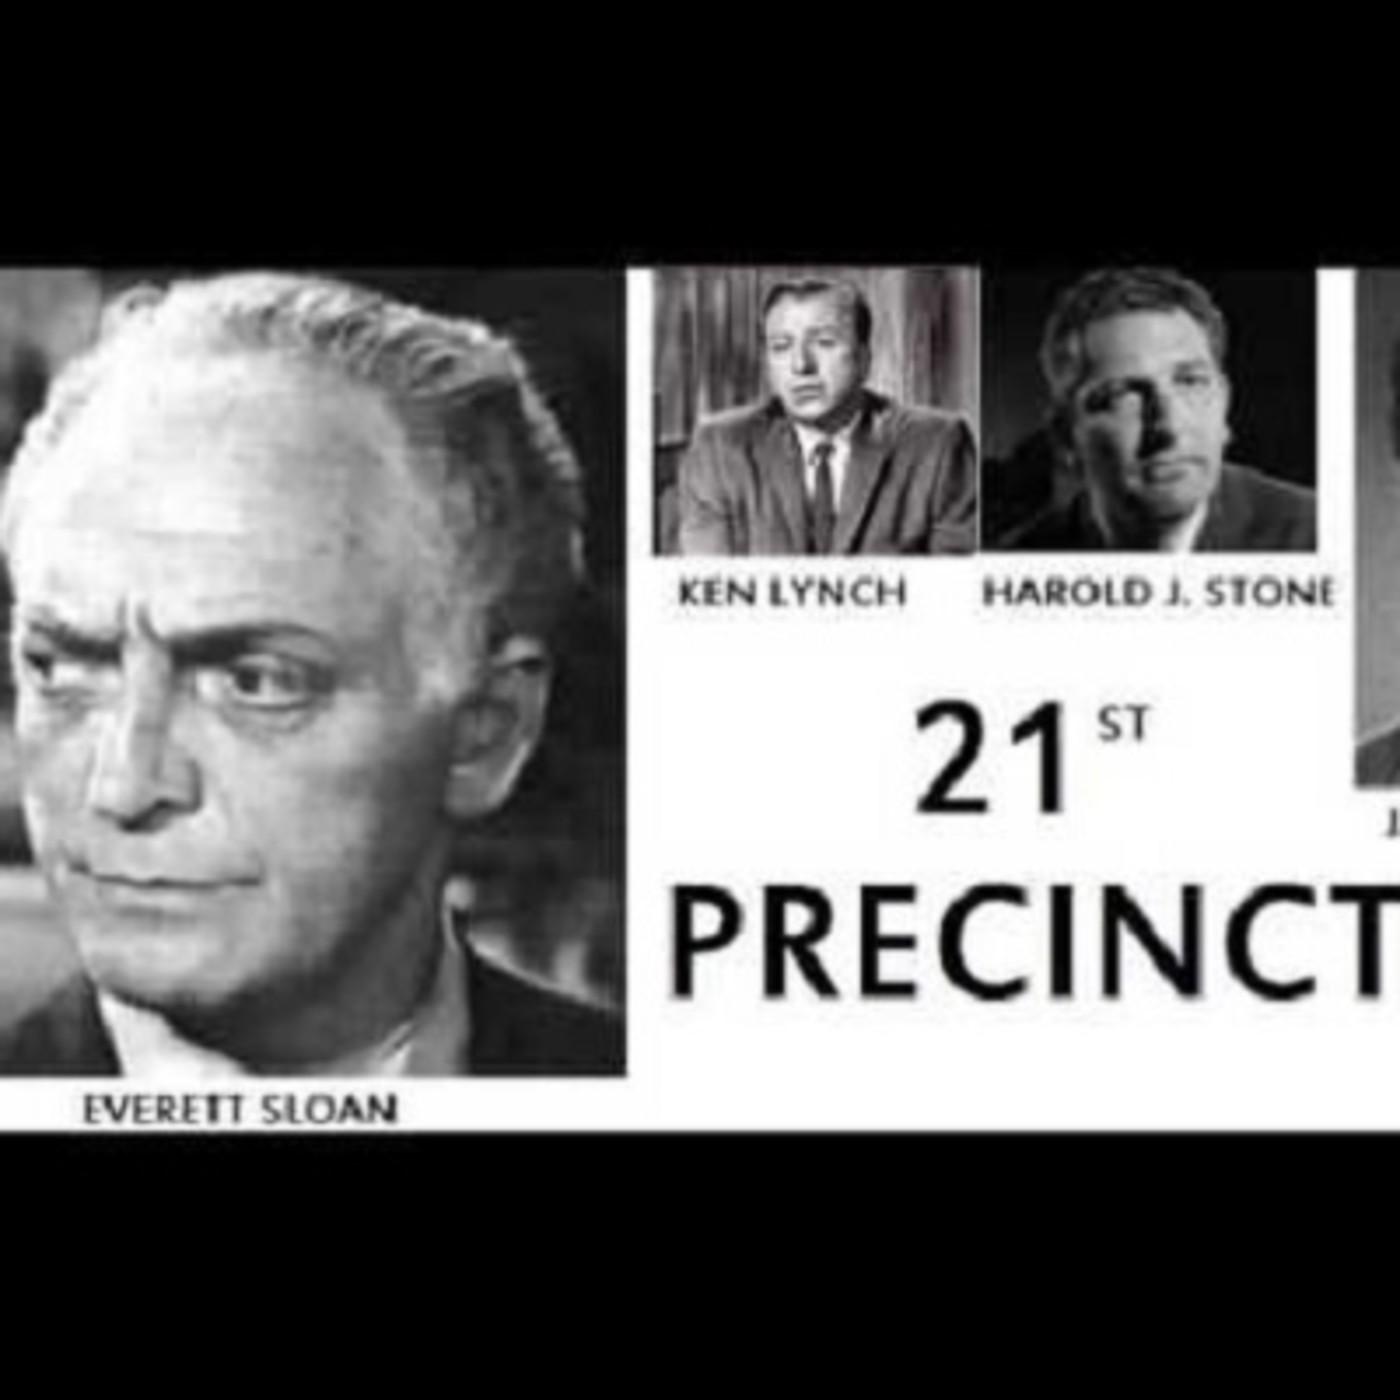 21st_Precinct_54-07-21_ep054_The_Ledge